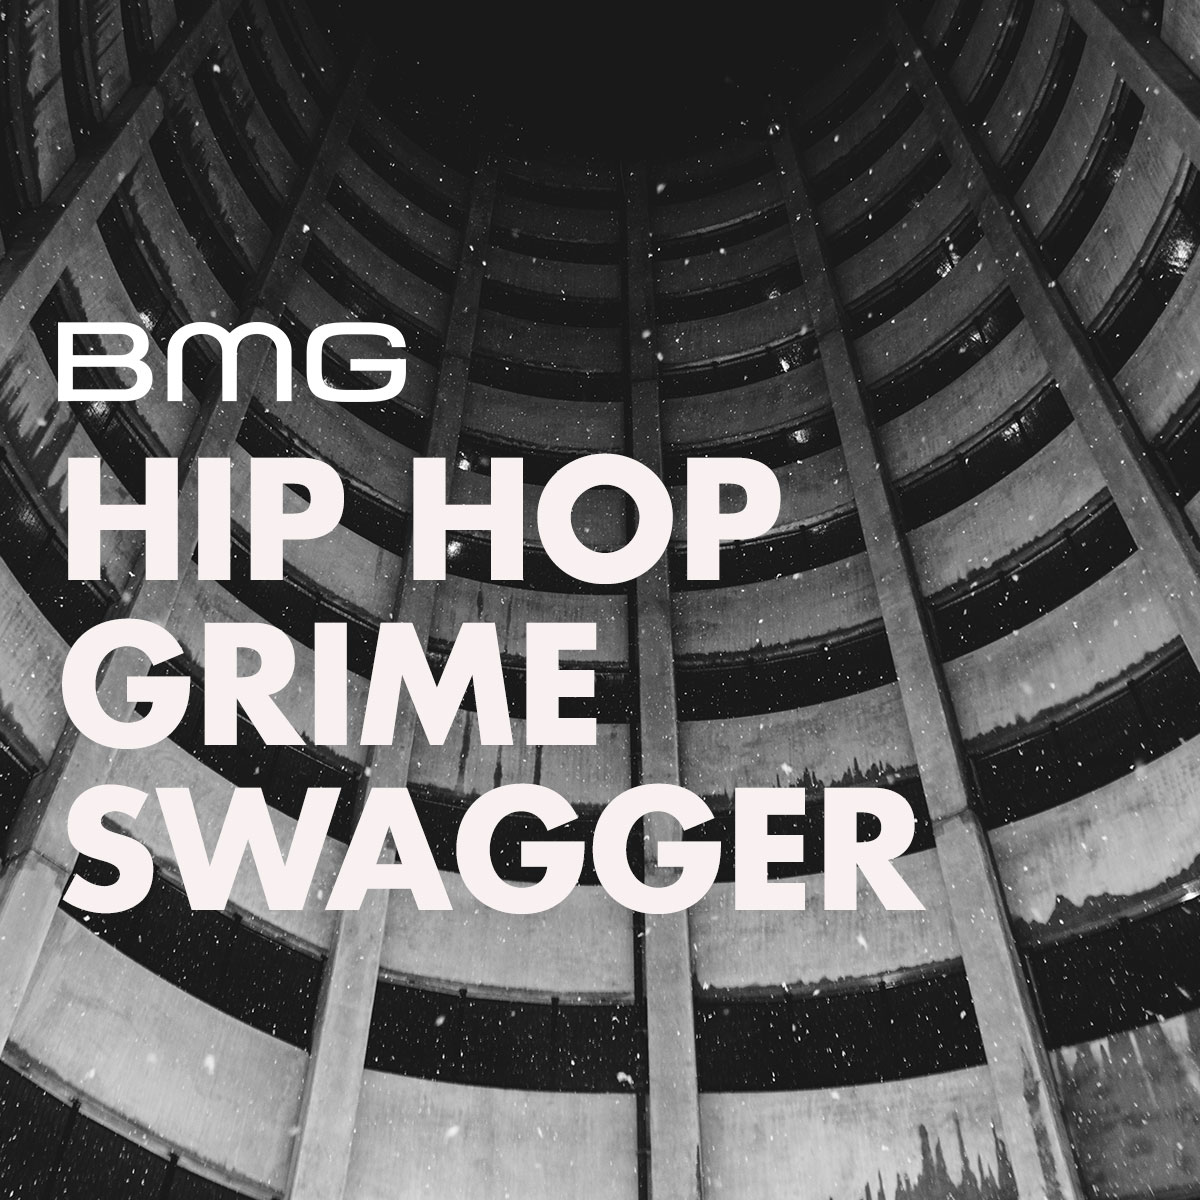 1200-x-1200-Hip-Hop-Grime-Swagger.jpg